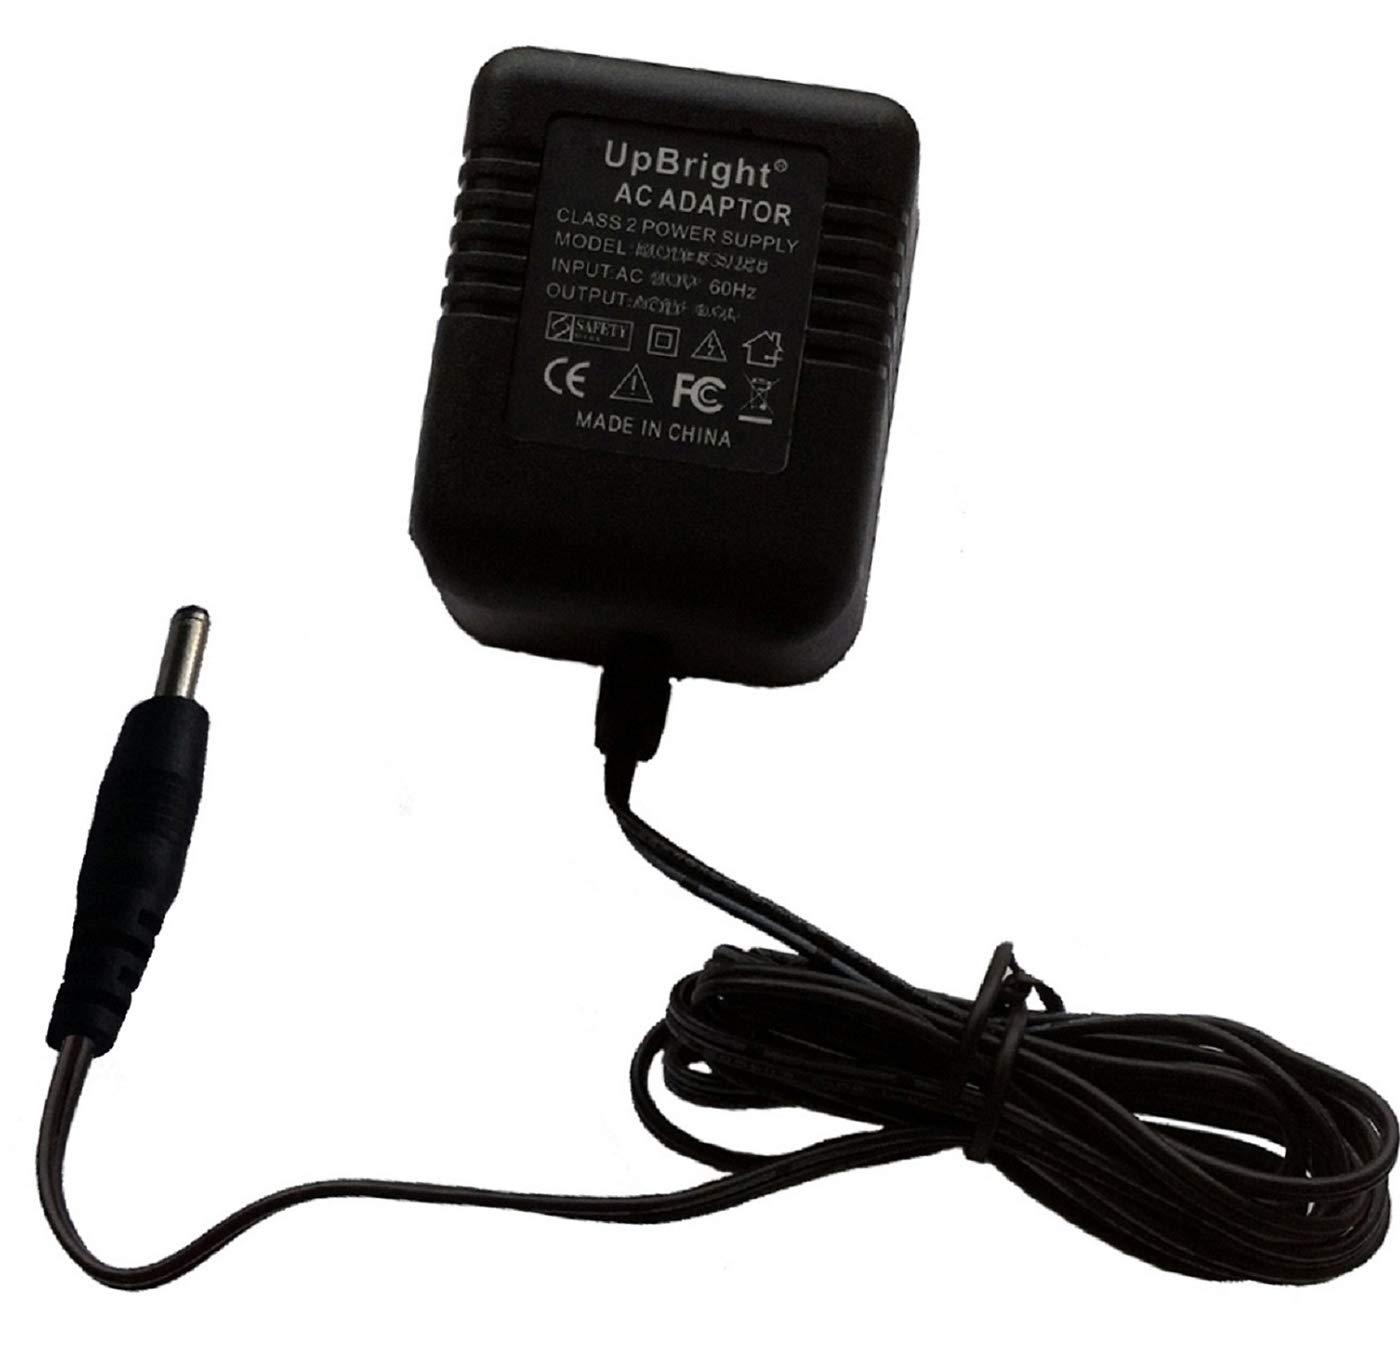 UpBright AC Adapter Replacement for Bosch Skil 2607225503 2607225422 KA12D060030024U 2350-01 2354-04 2346 IXO3 iXO IX03 2352 2348 3.6V 4 Volt ...